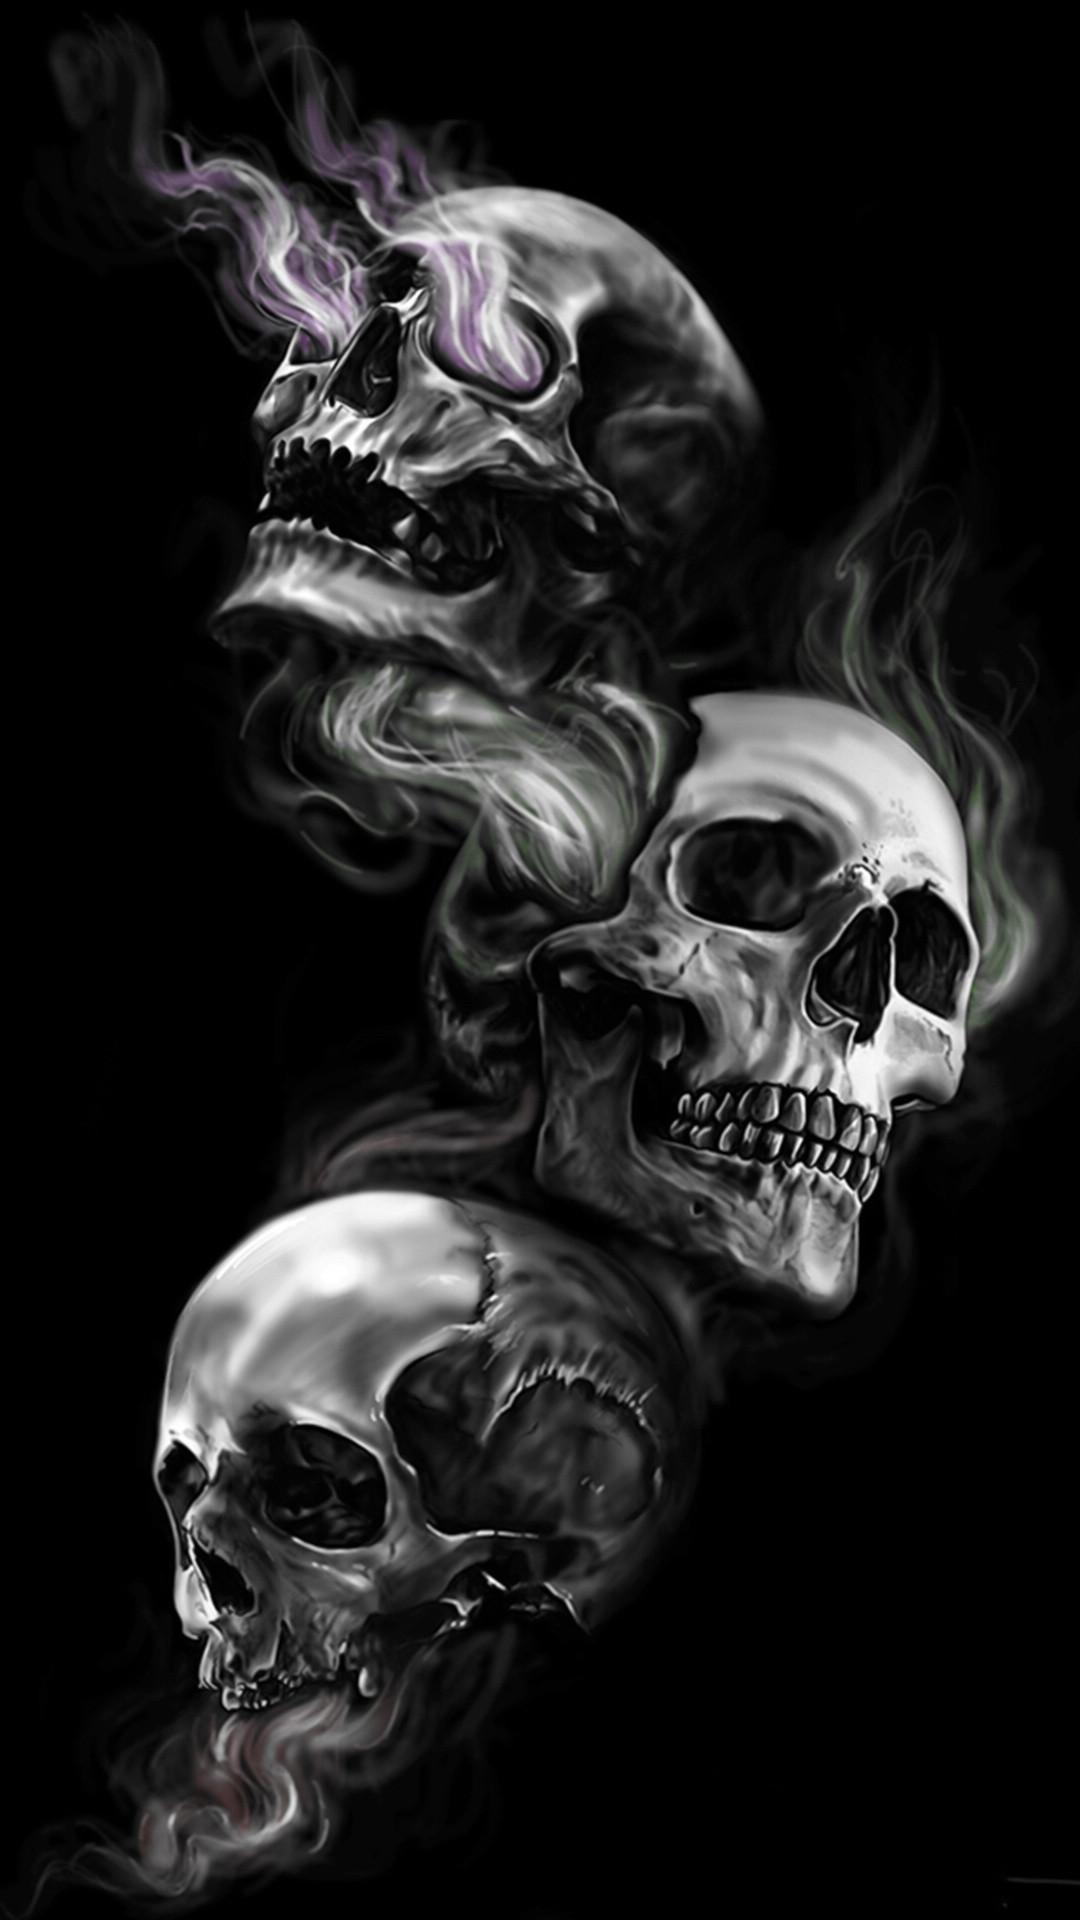 Badass wallpapers of skulls 61 images - Skeleton wallpaper ...